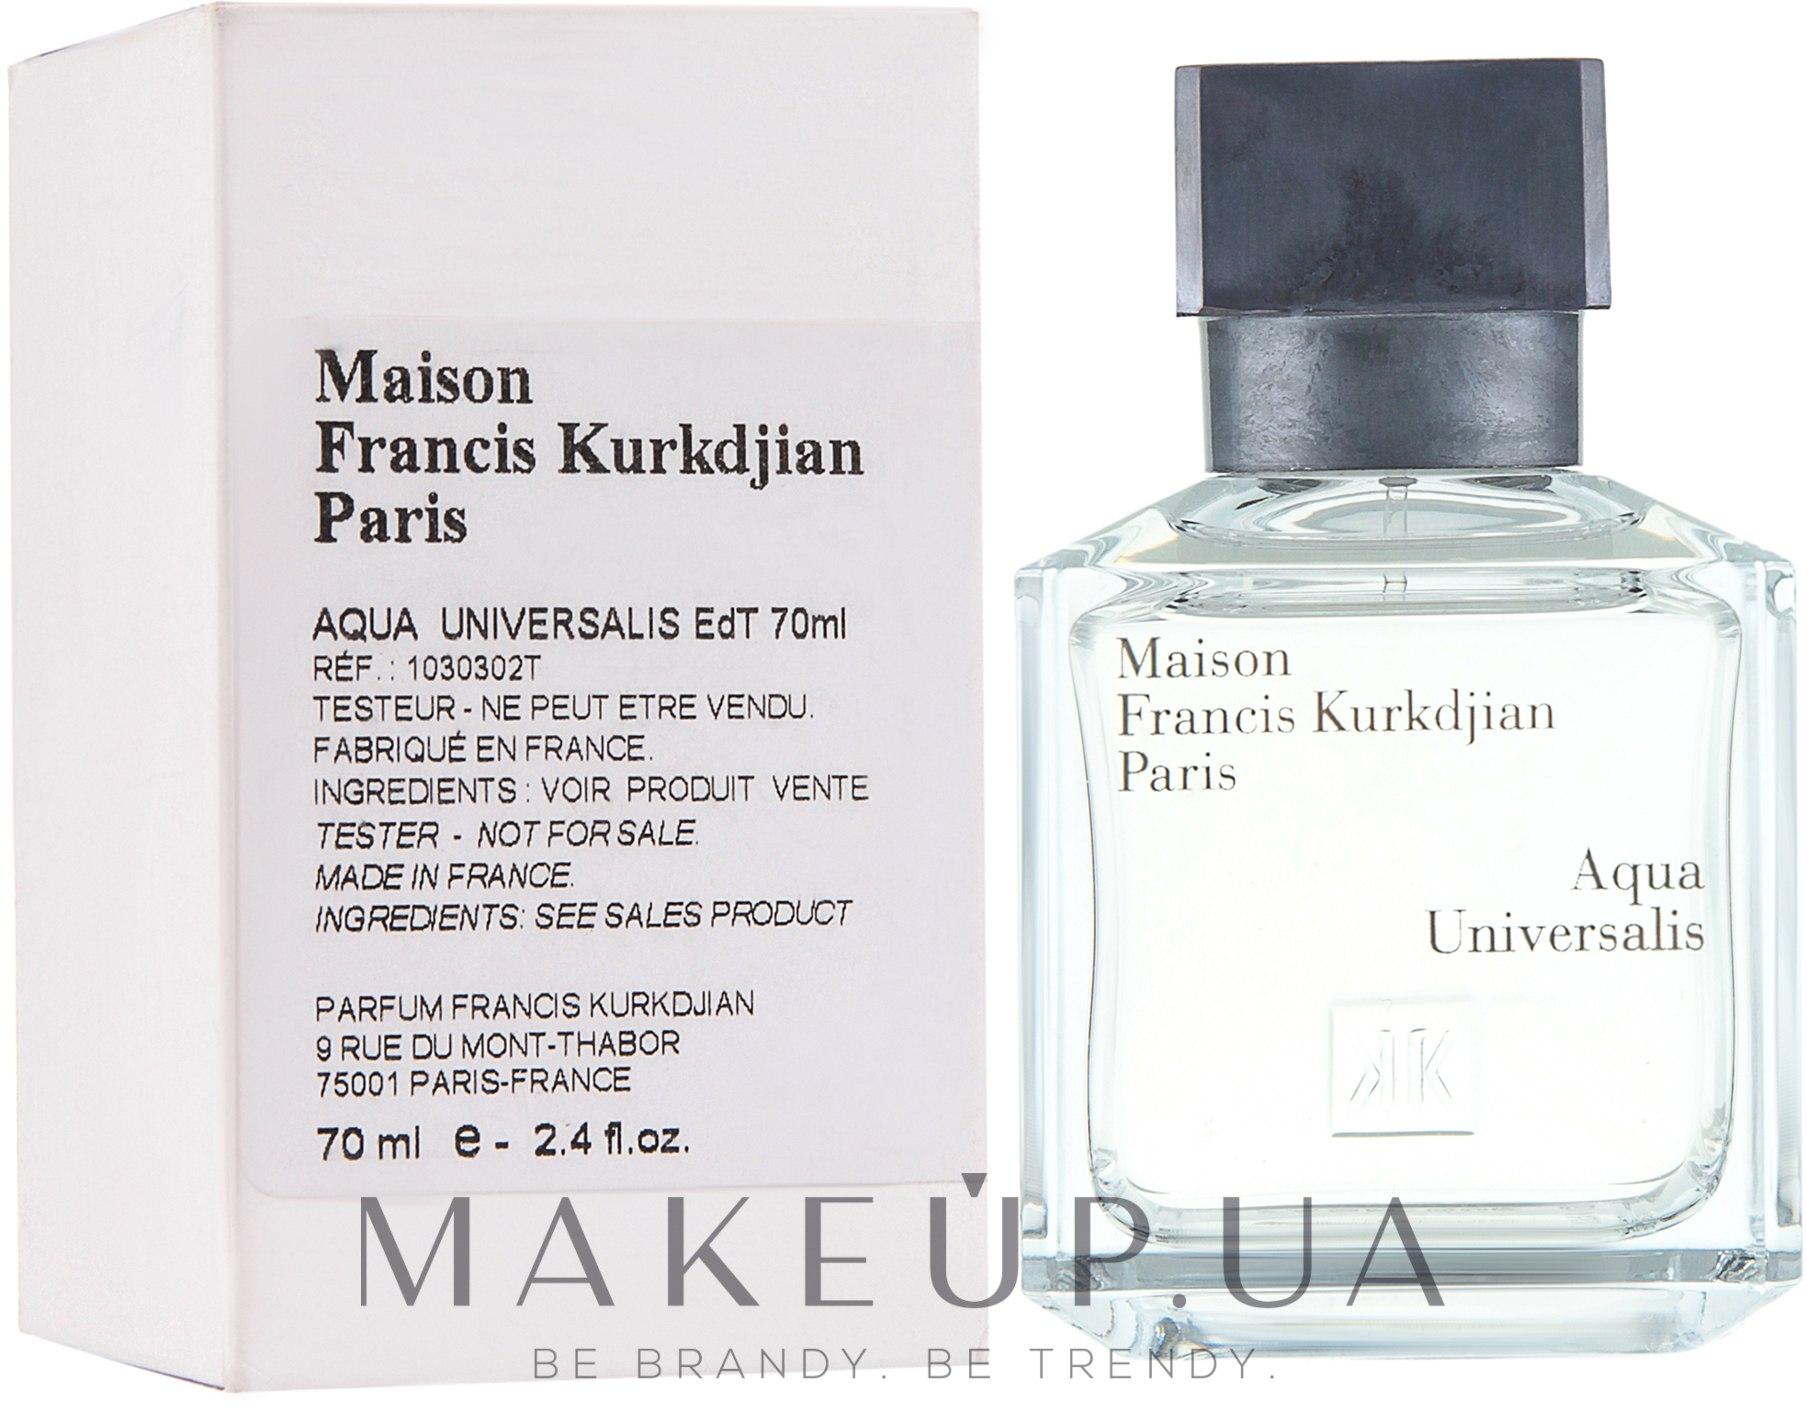 Makeup maison francis kurkdjian aqua universalis for Acqua universalis maison francis kurkdjian